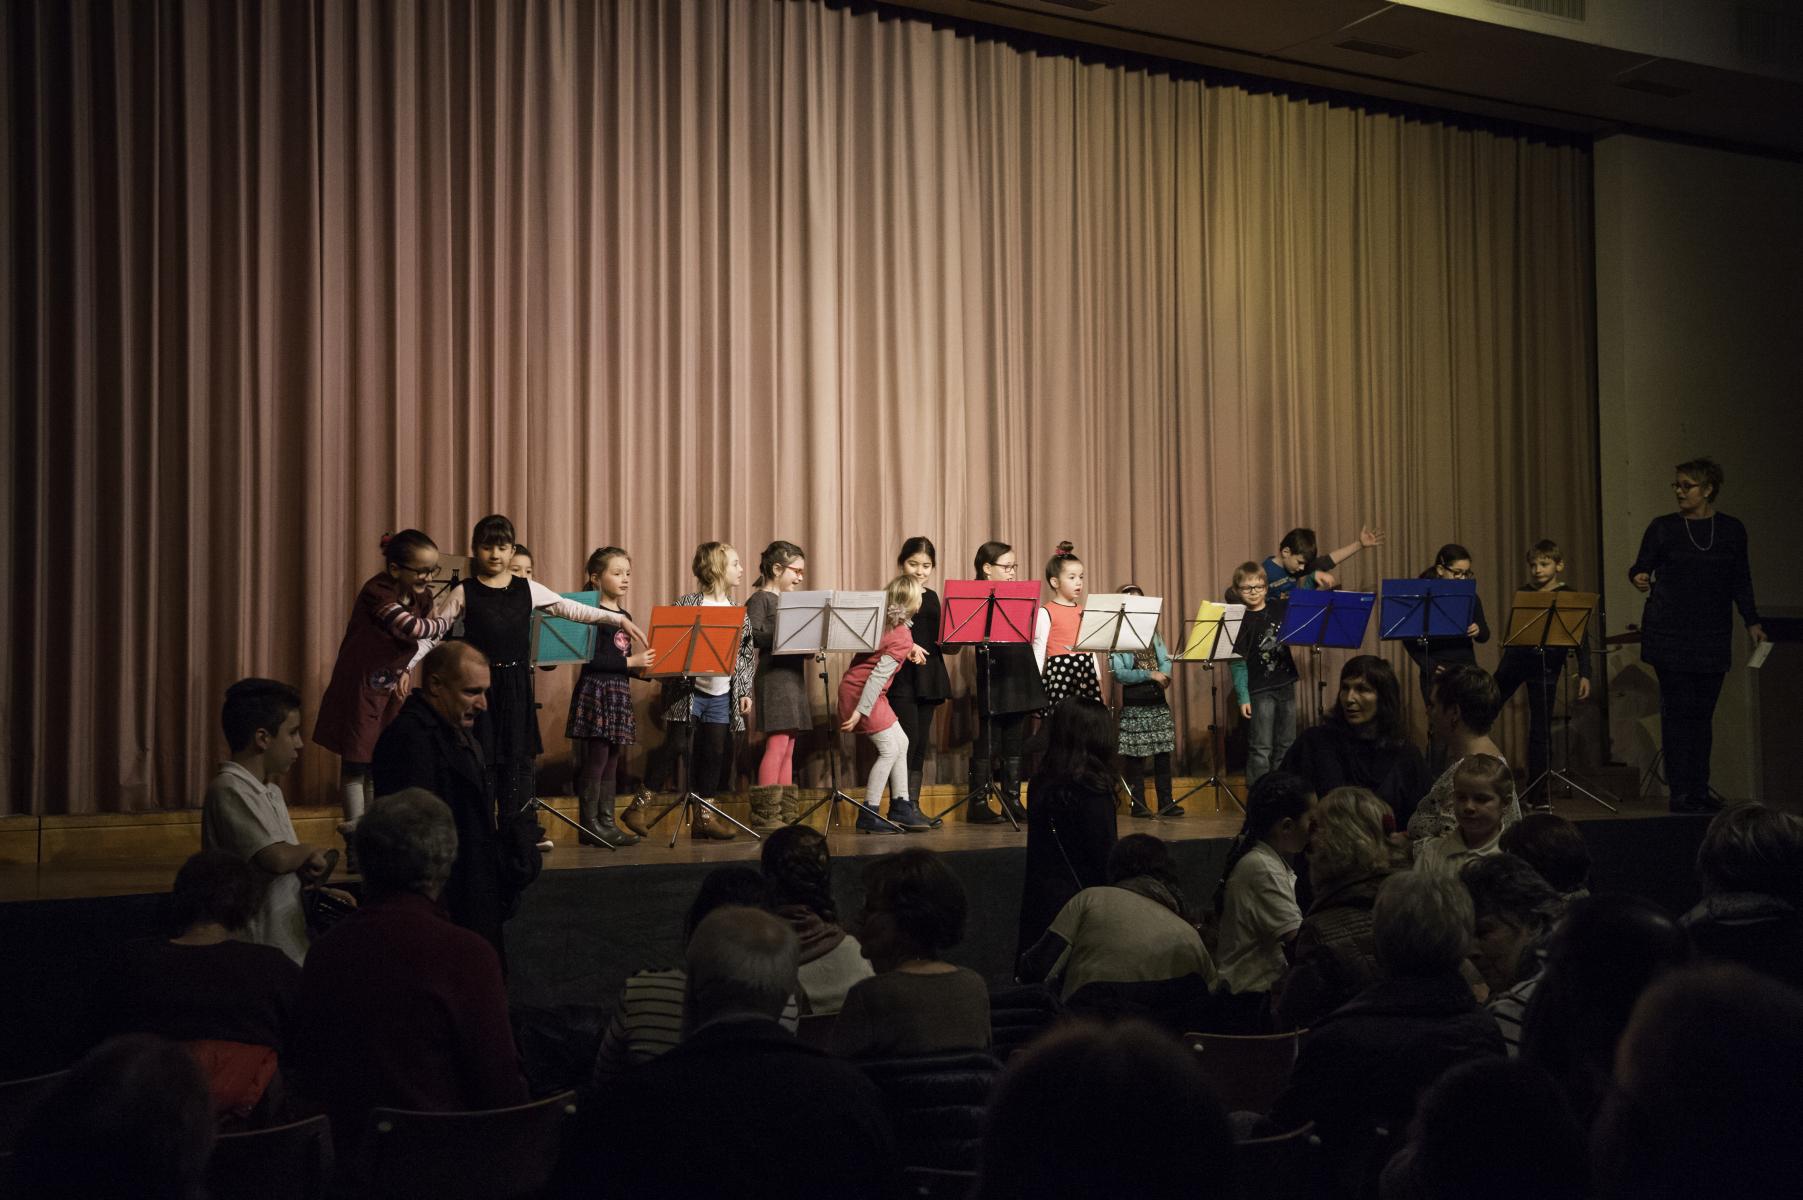 170211_concert_annuel17-002